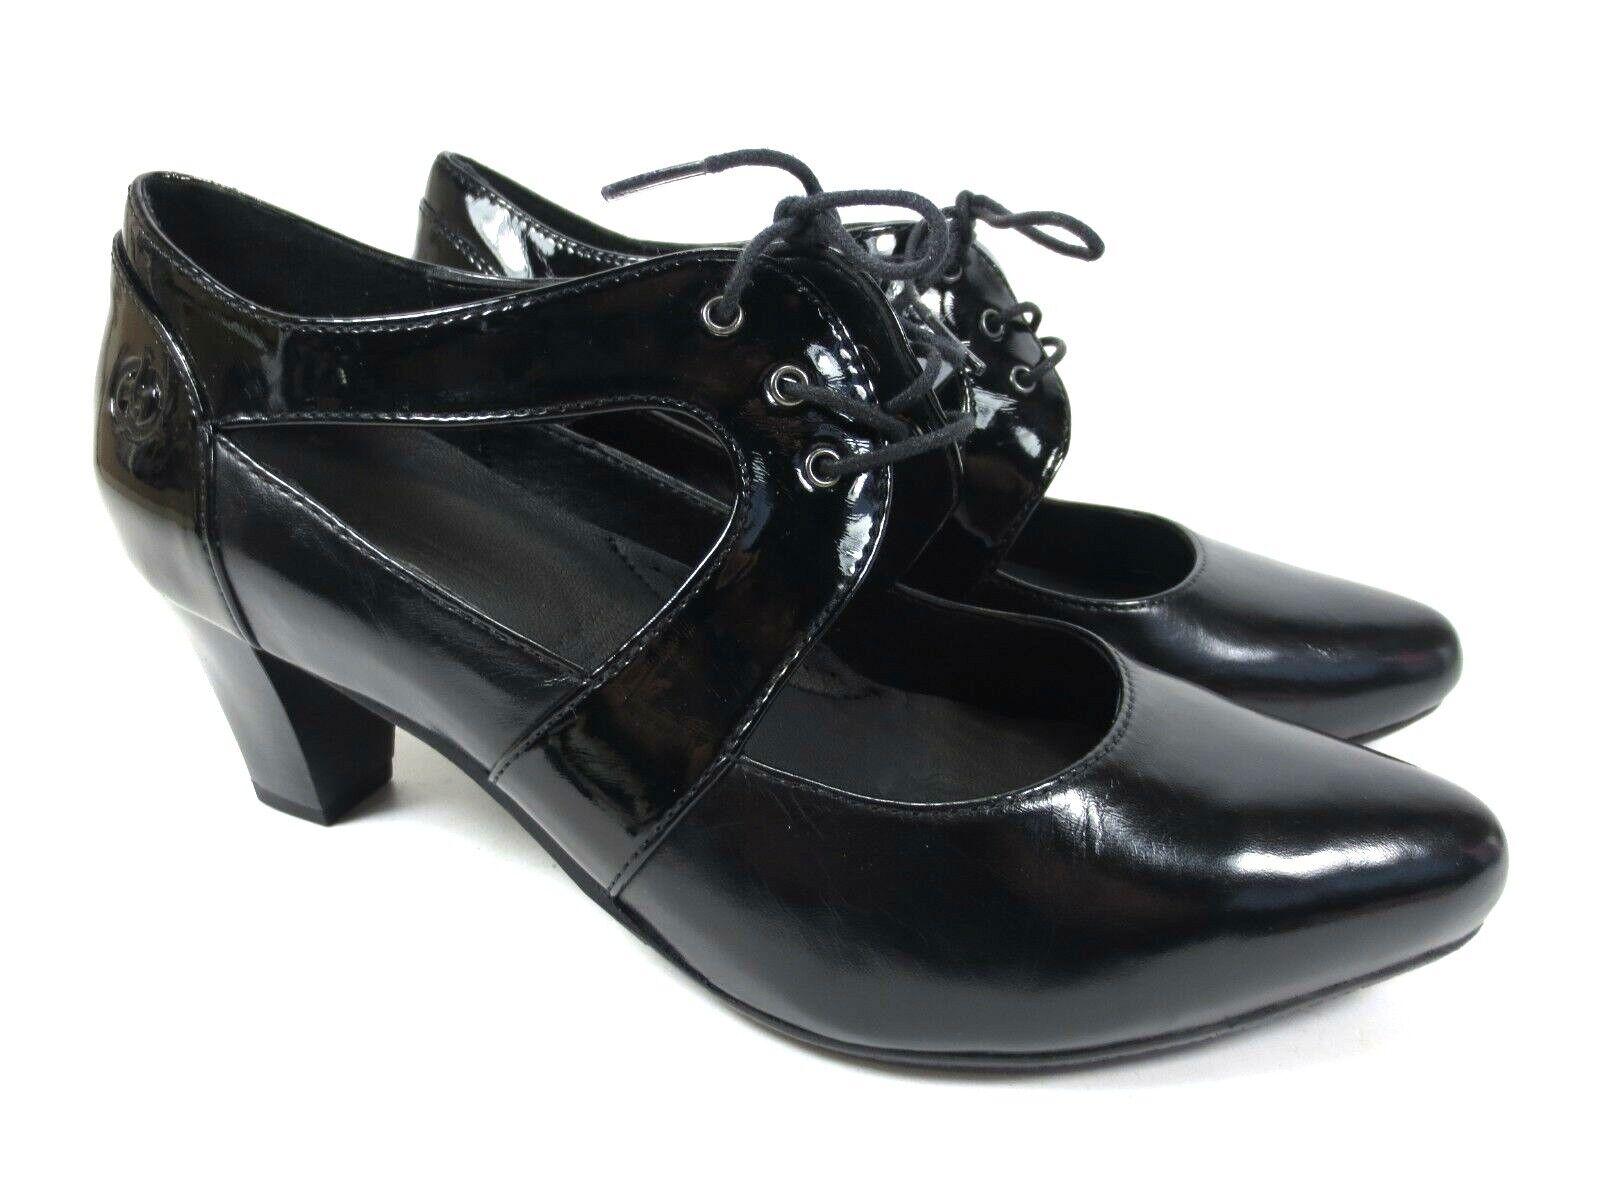 GERRY WEBER Spangen Pumps Leder Schuhe Mary Jane Jane Jane weich gepolstert NEU 99,95  | Günstigstes  ad8d19